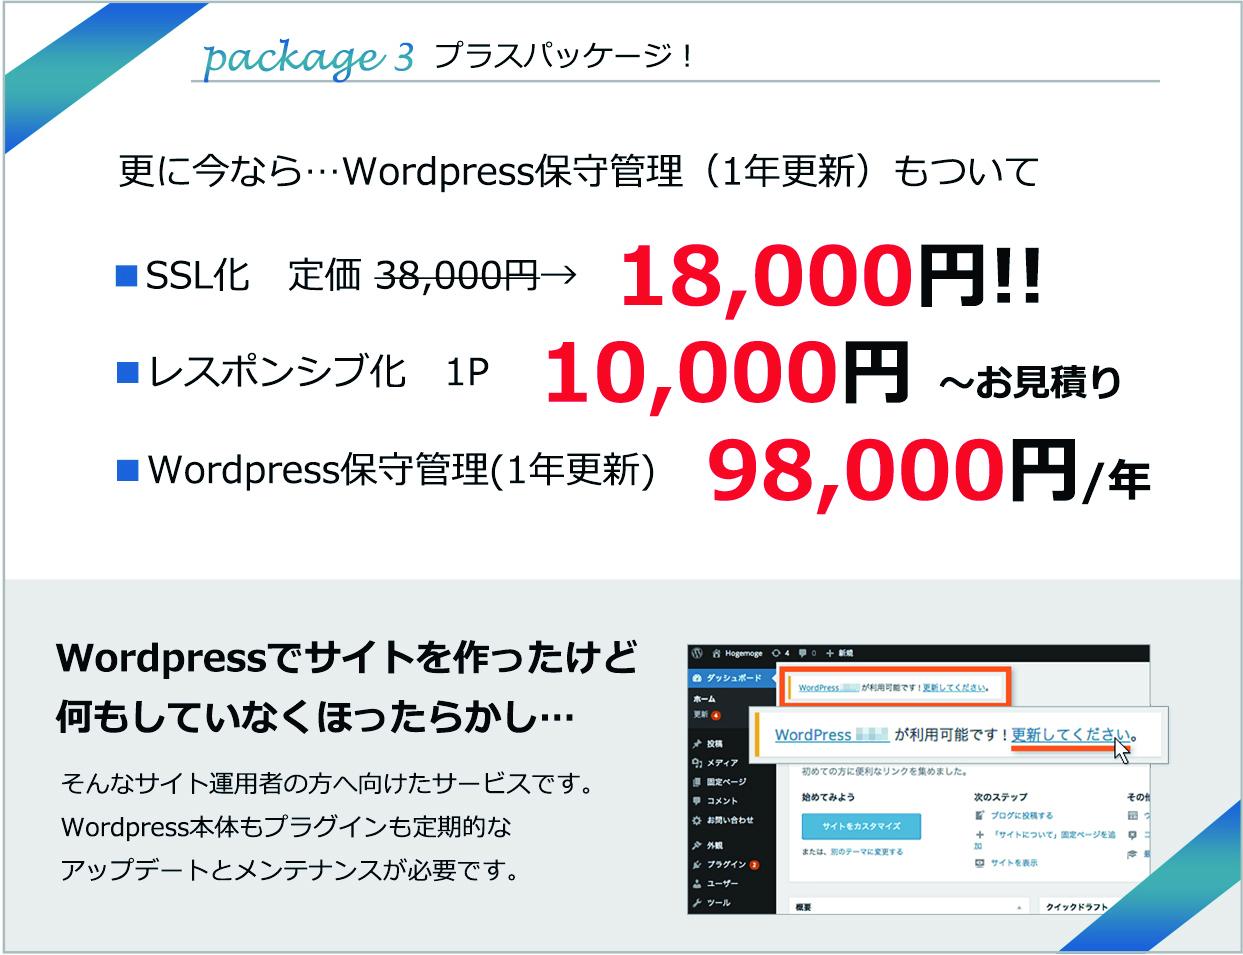 Wordpress保守管理(1年更新)